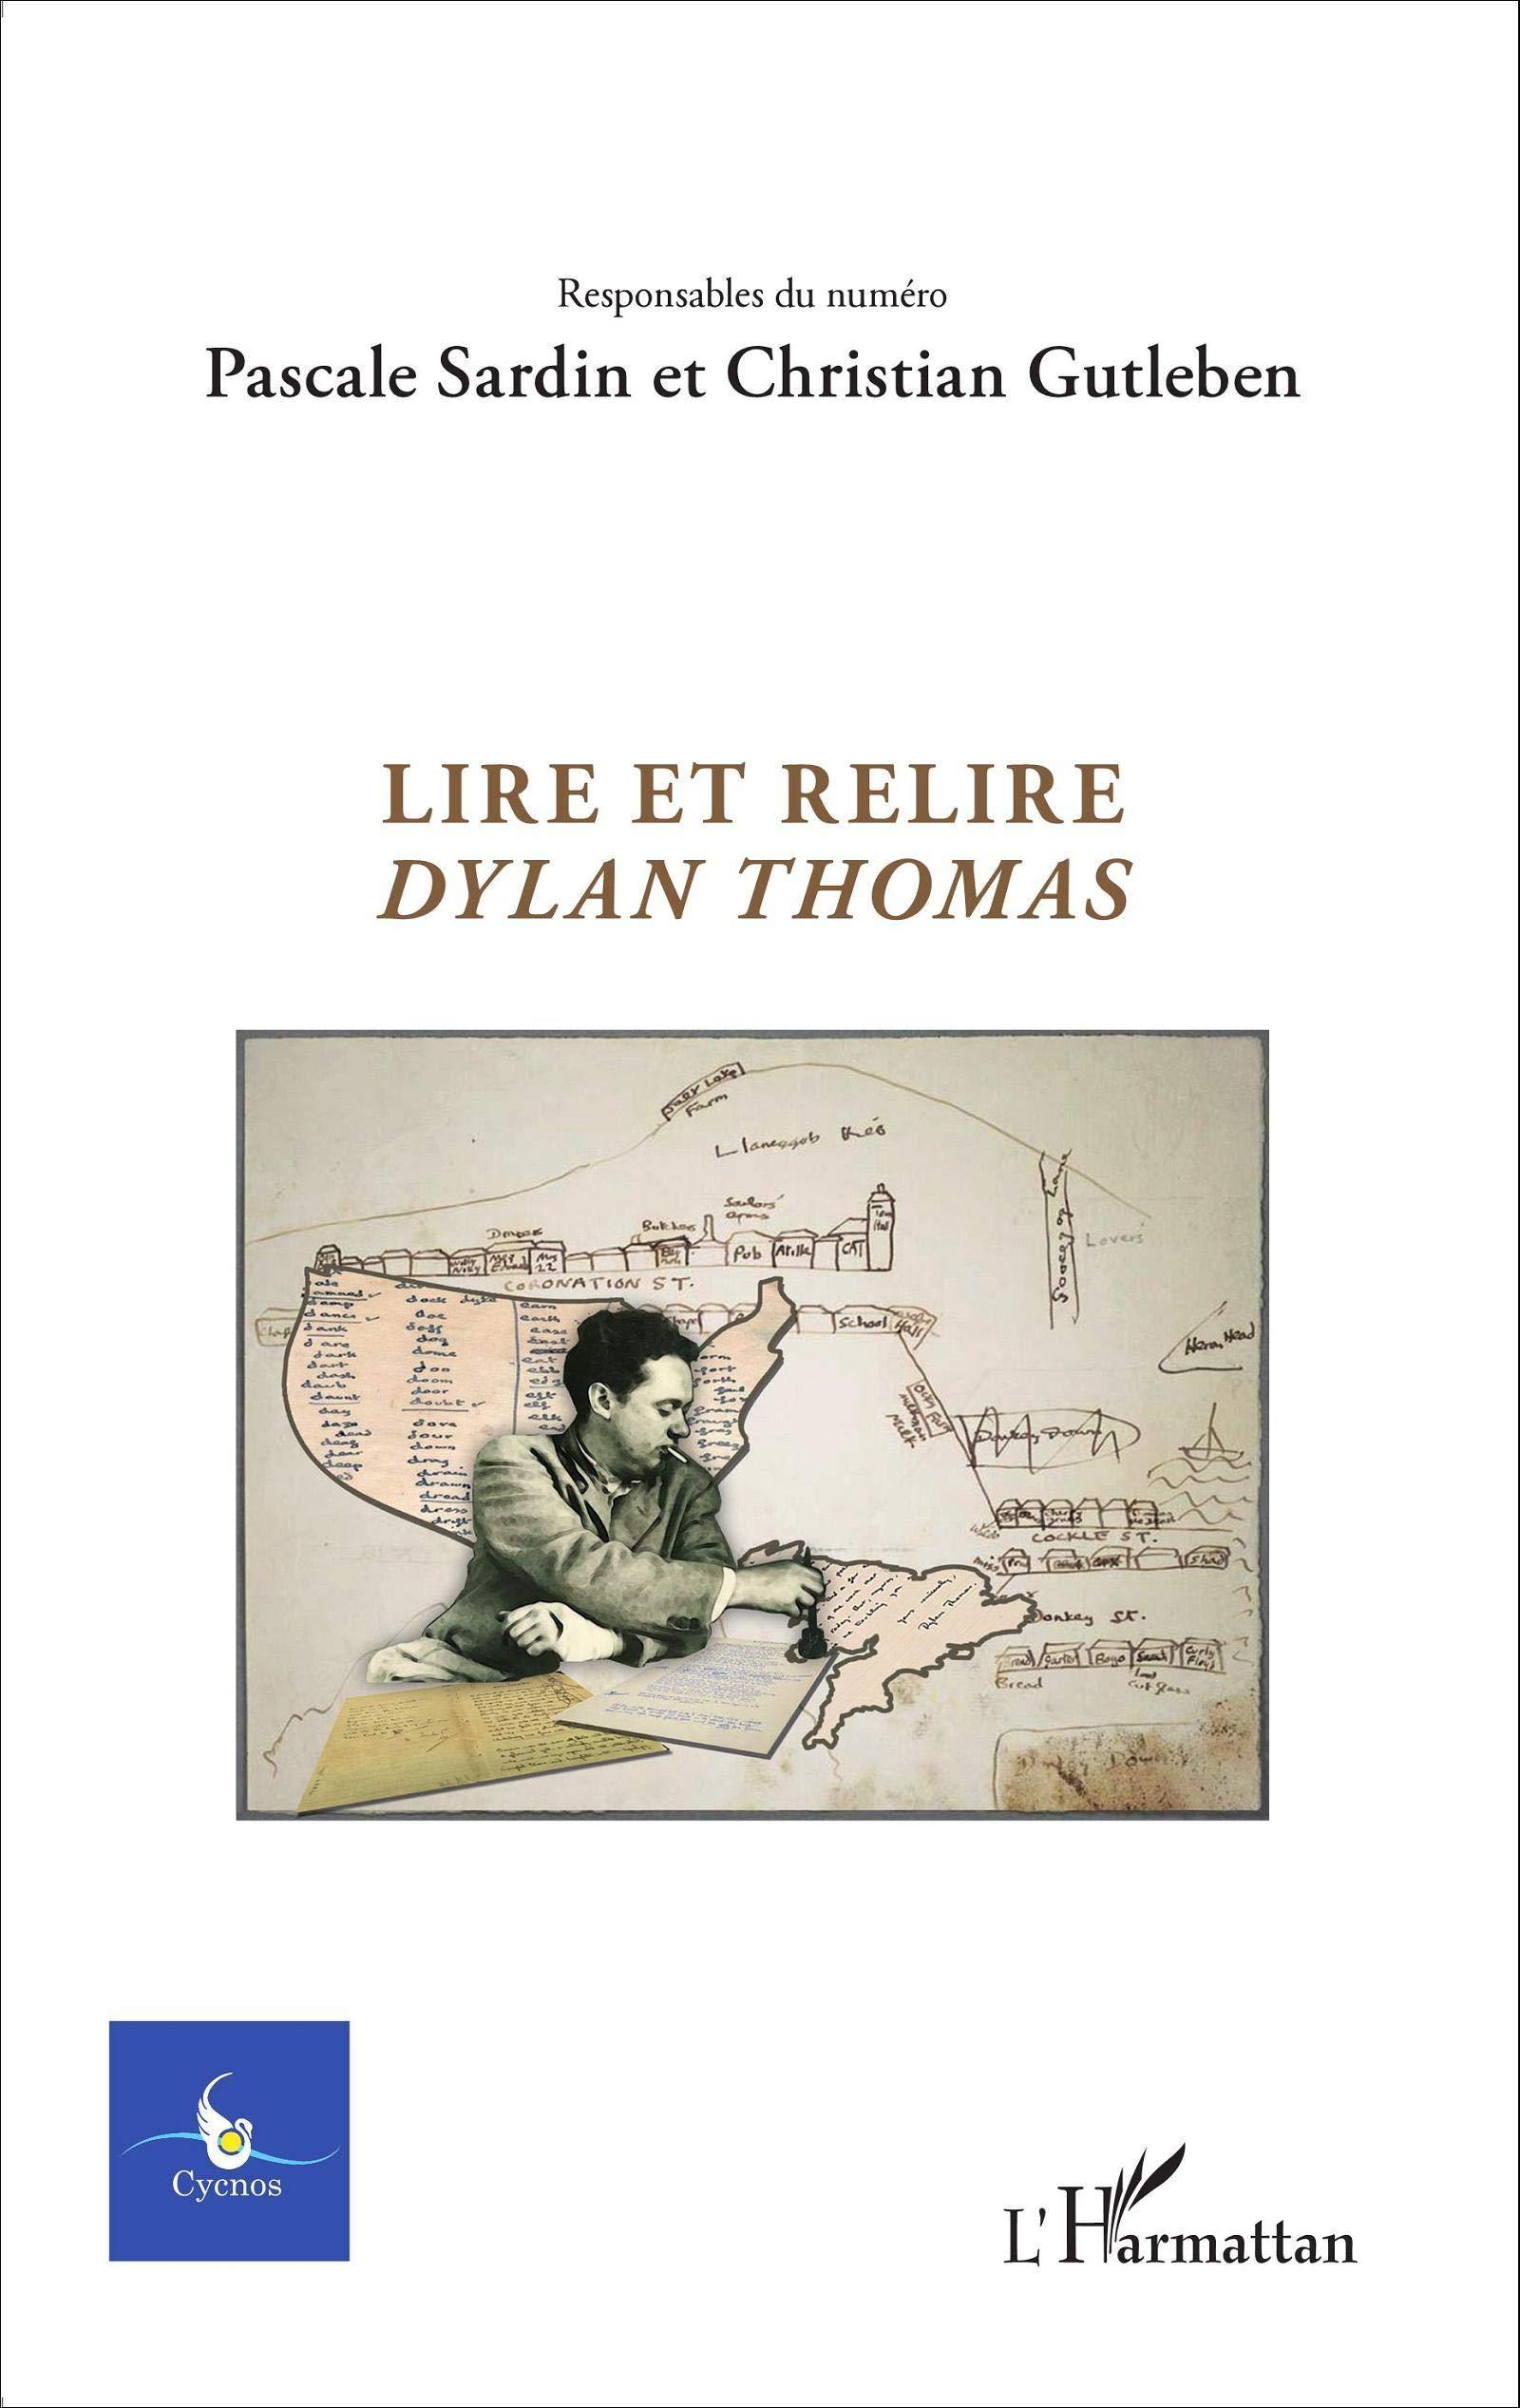 Lire Et Relire Dylan Thomas N 2 2015 Cycnos French Edition Sardin Pascale Gutleben Christian 9782343079905 Amazon Com Books